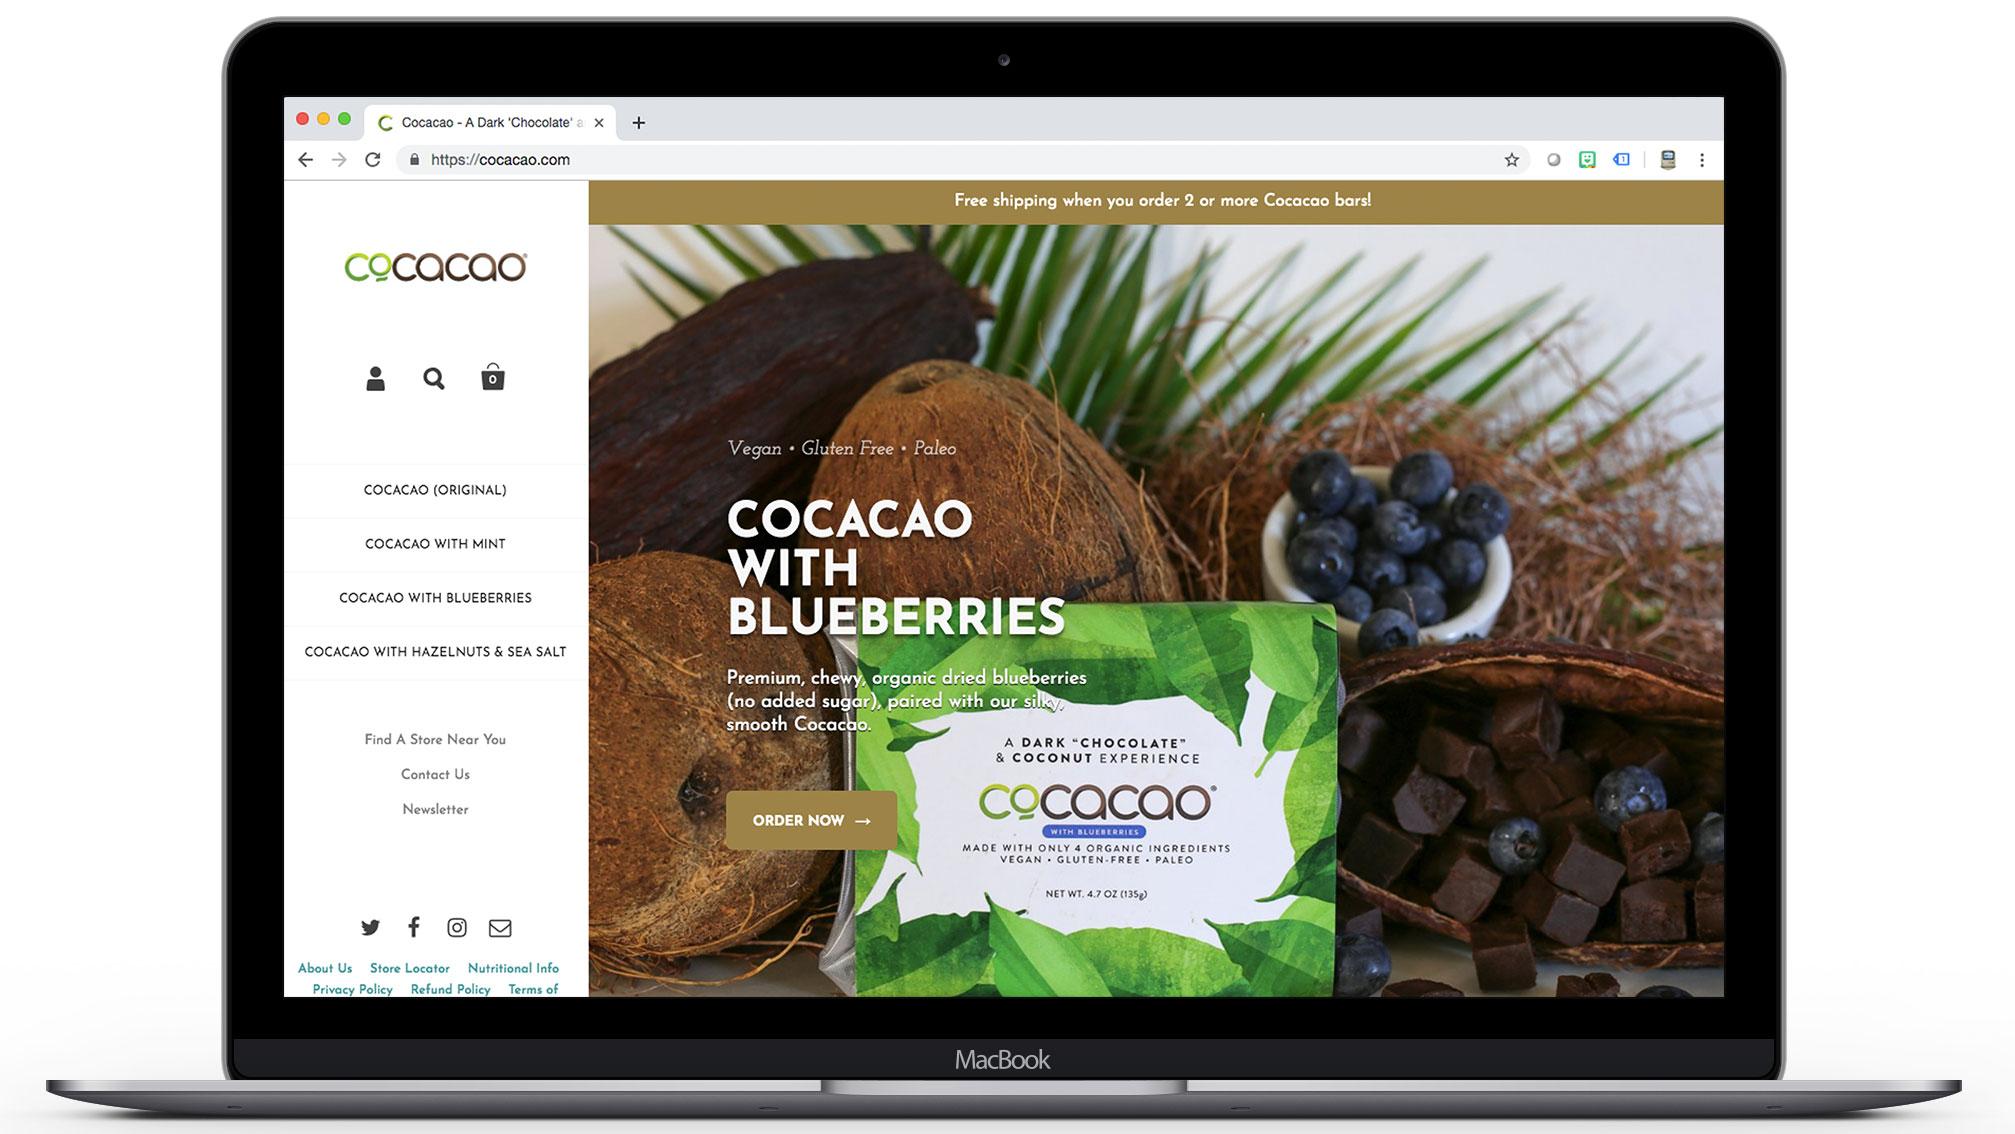 cocacao-website-aria-interactive_1.jpg